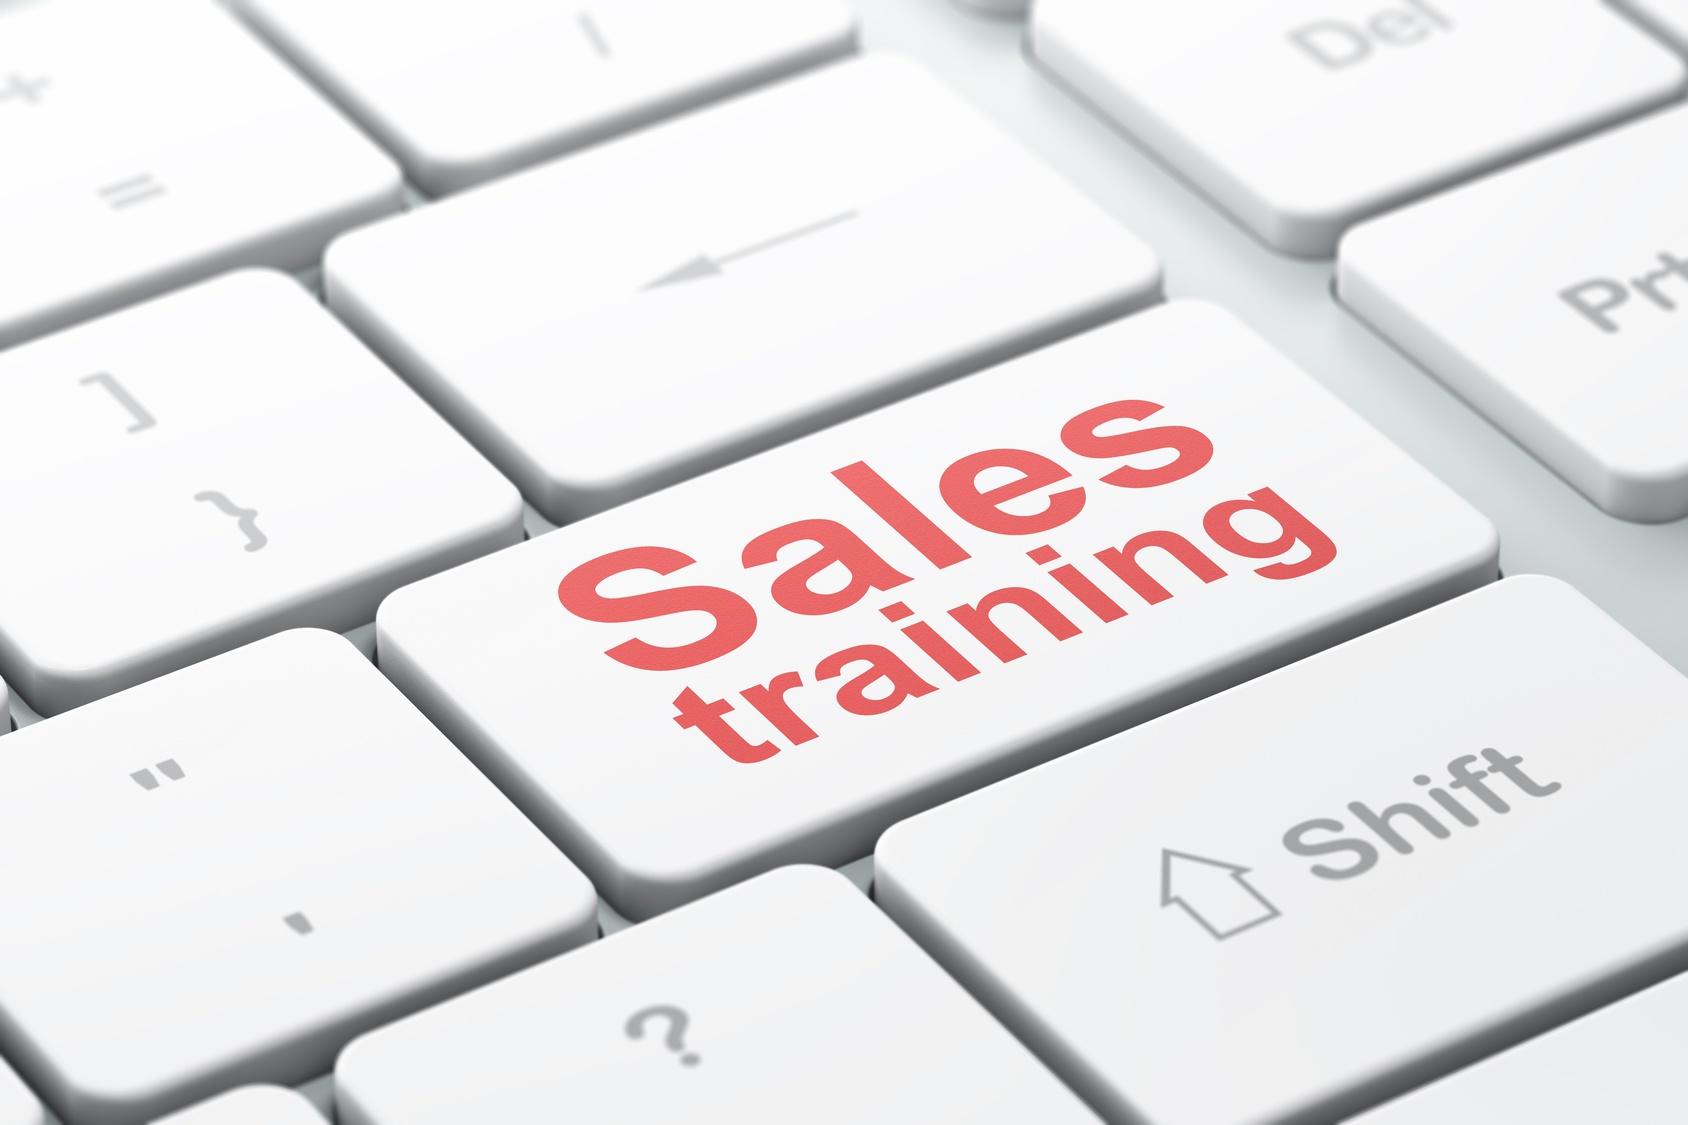 Sales_Training_Keyboard.jpg